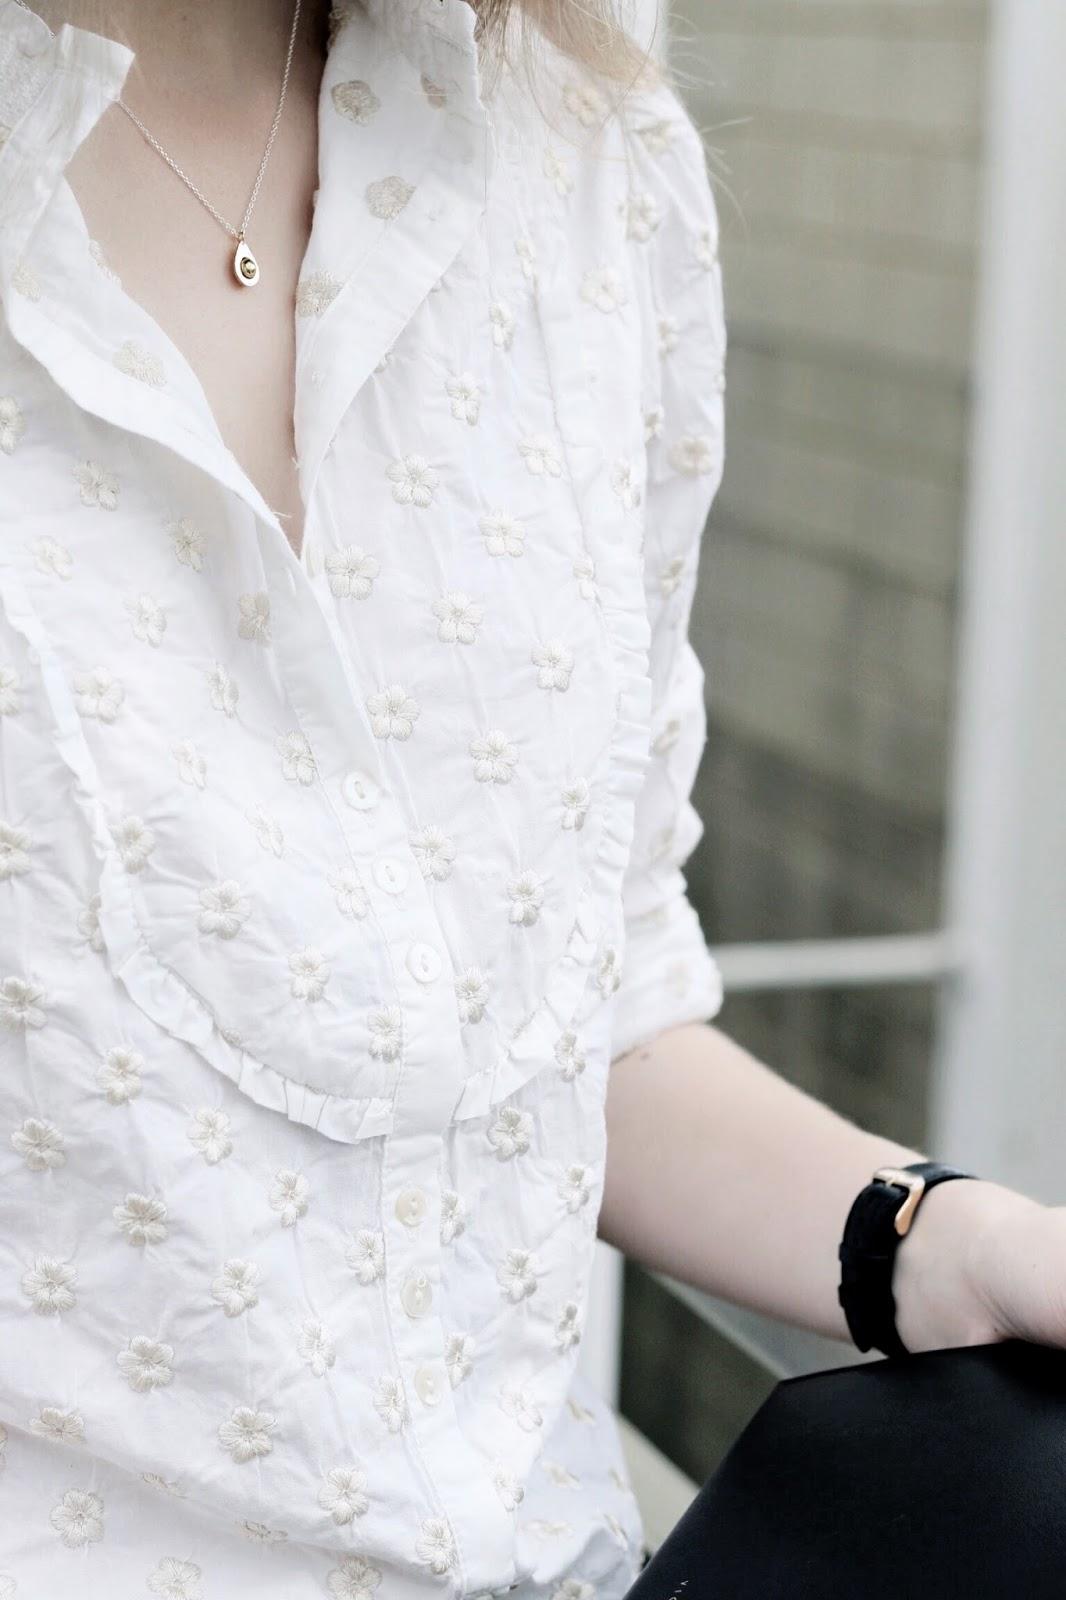 Estella Bartlett Avocado Necklace Blog